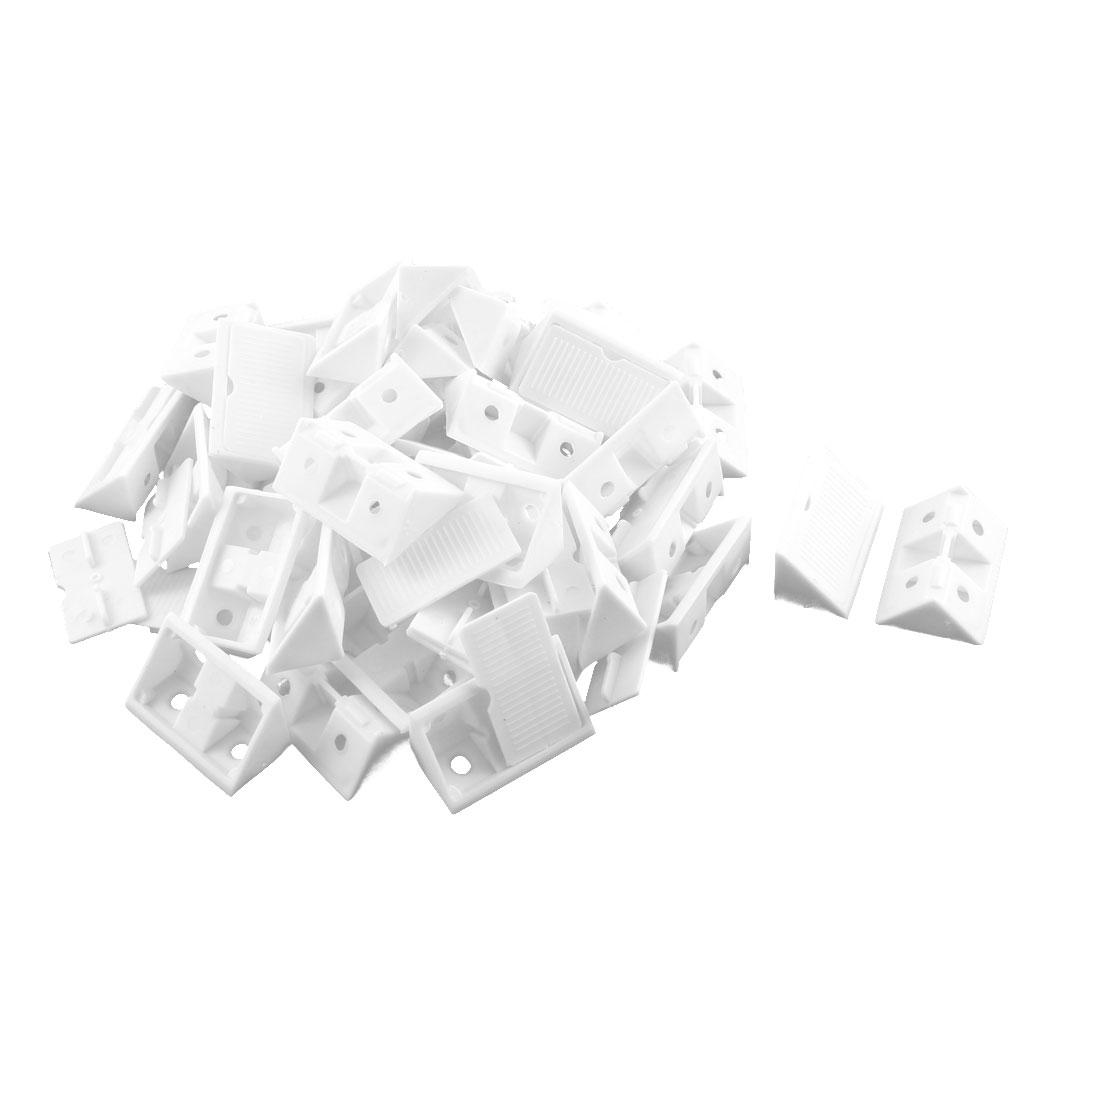 Furniture Cabinet Plastic Corner Bracket Angle Brace 42mm x 20mm x 20mm White 36 Set